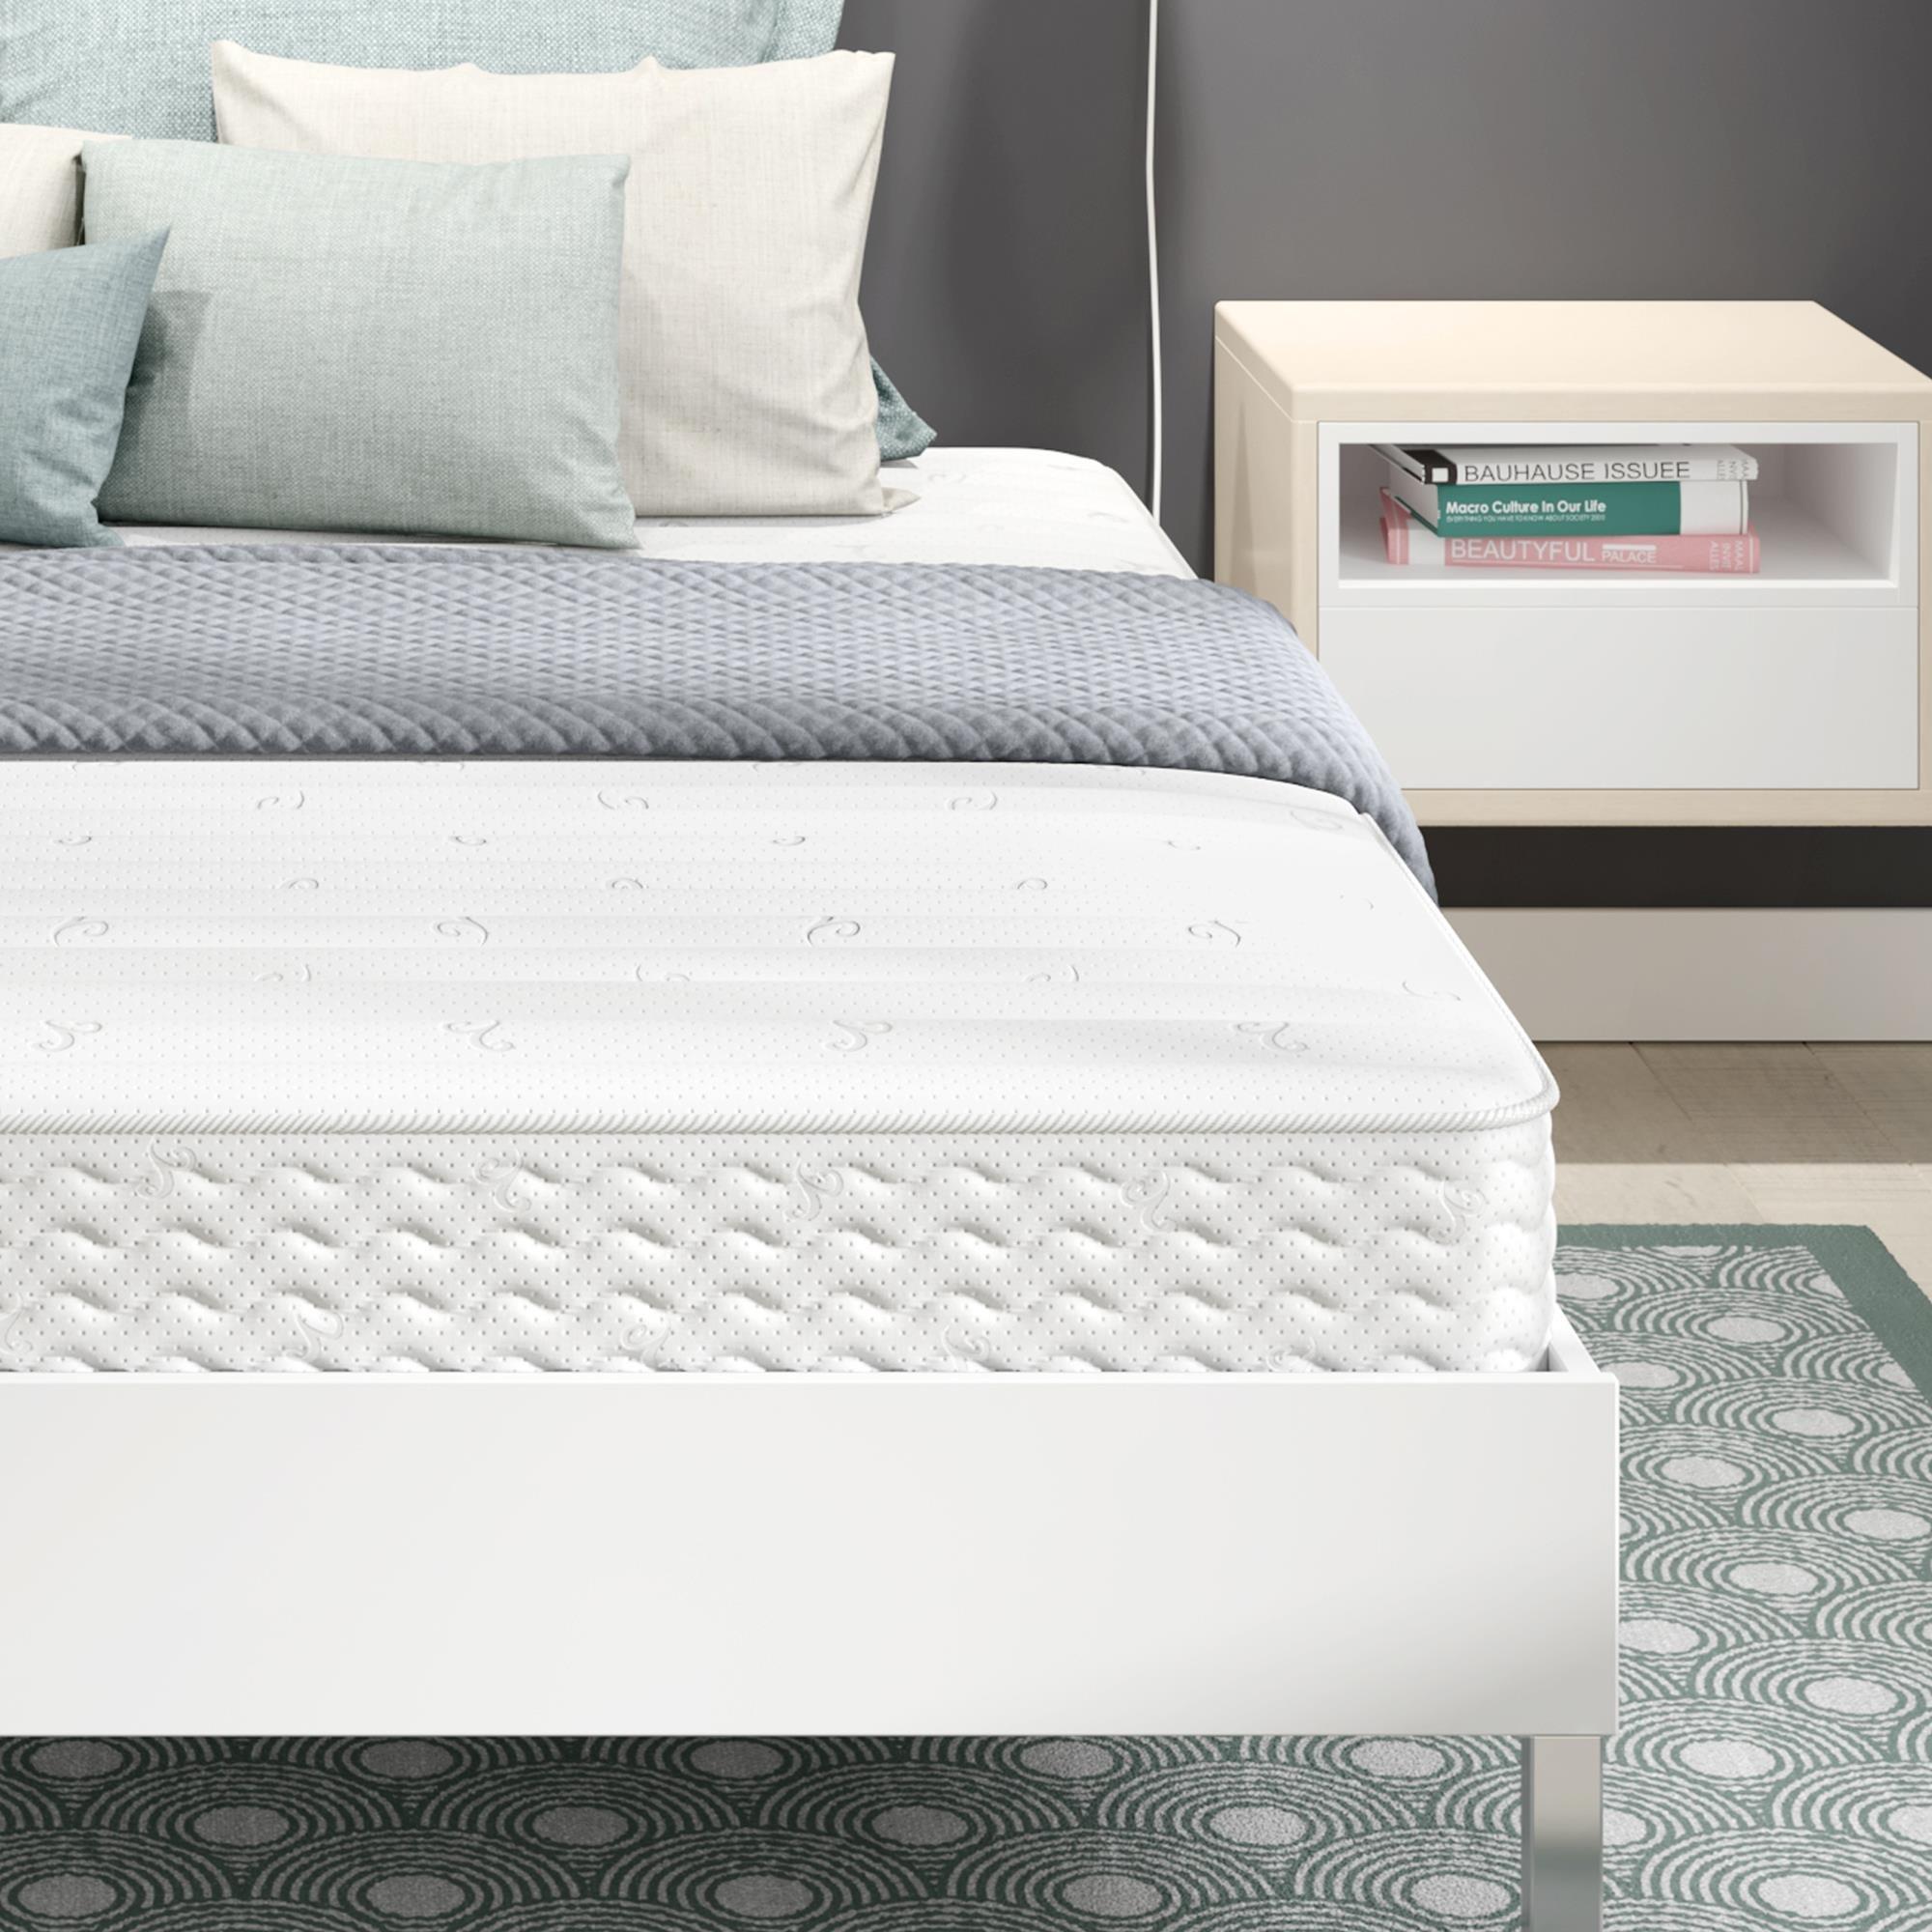 Signature Sleep 5436096 Contour Encased Mattress, Full, White by Signature Sleep